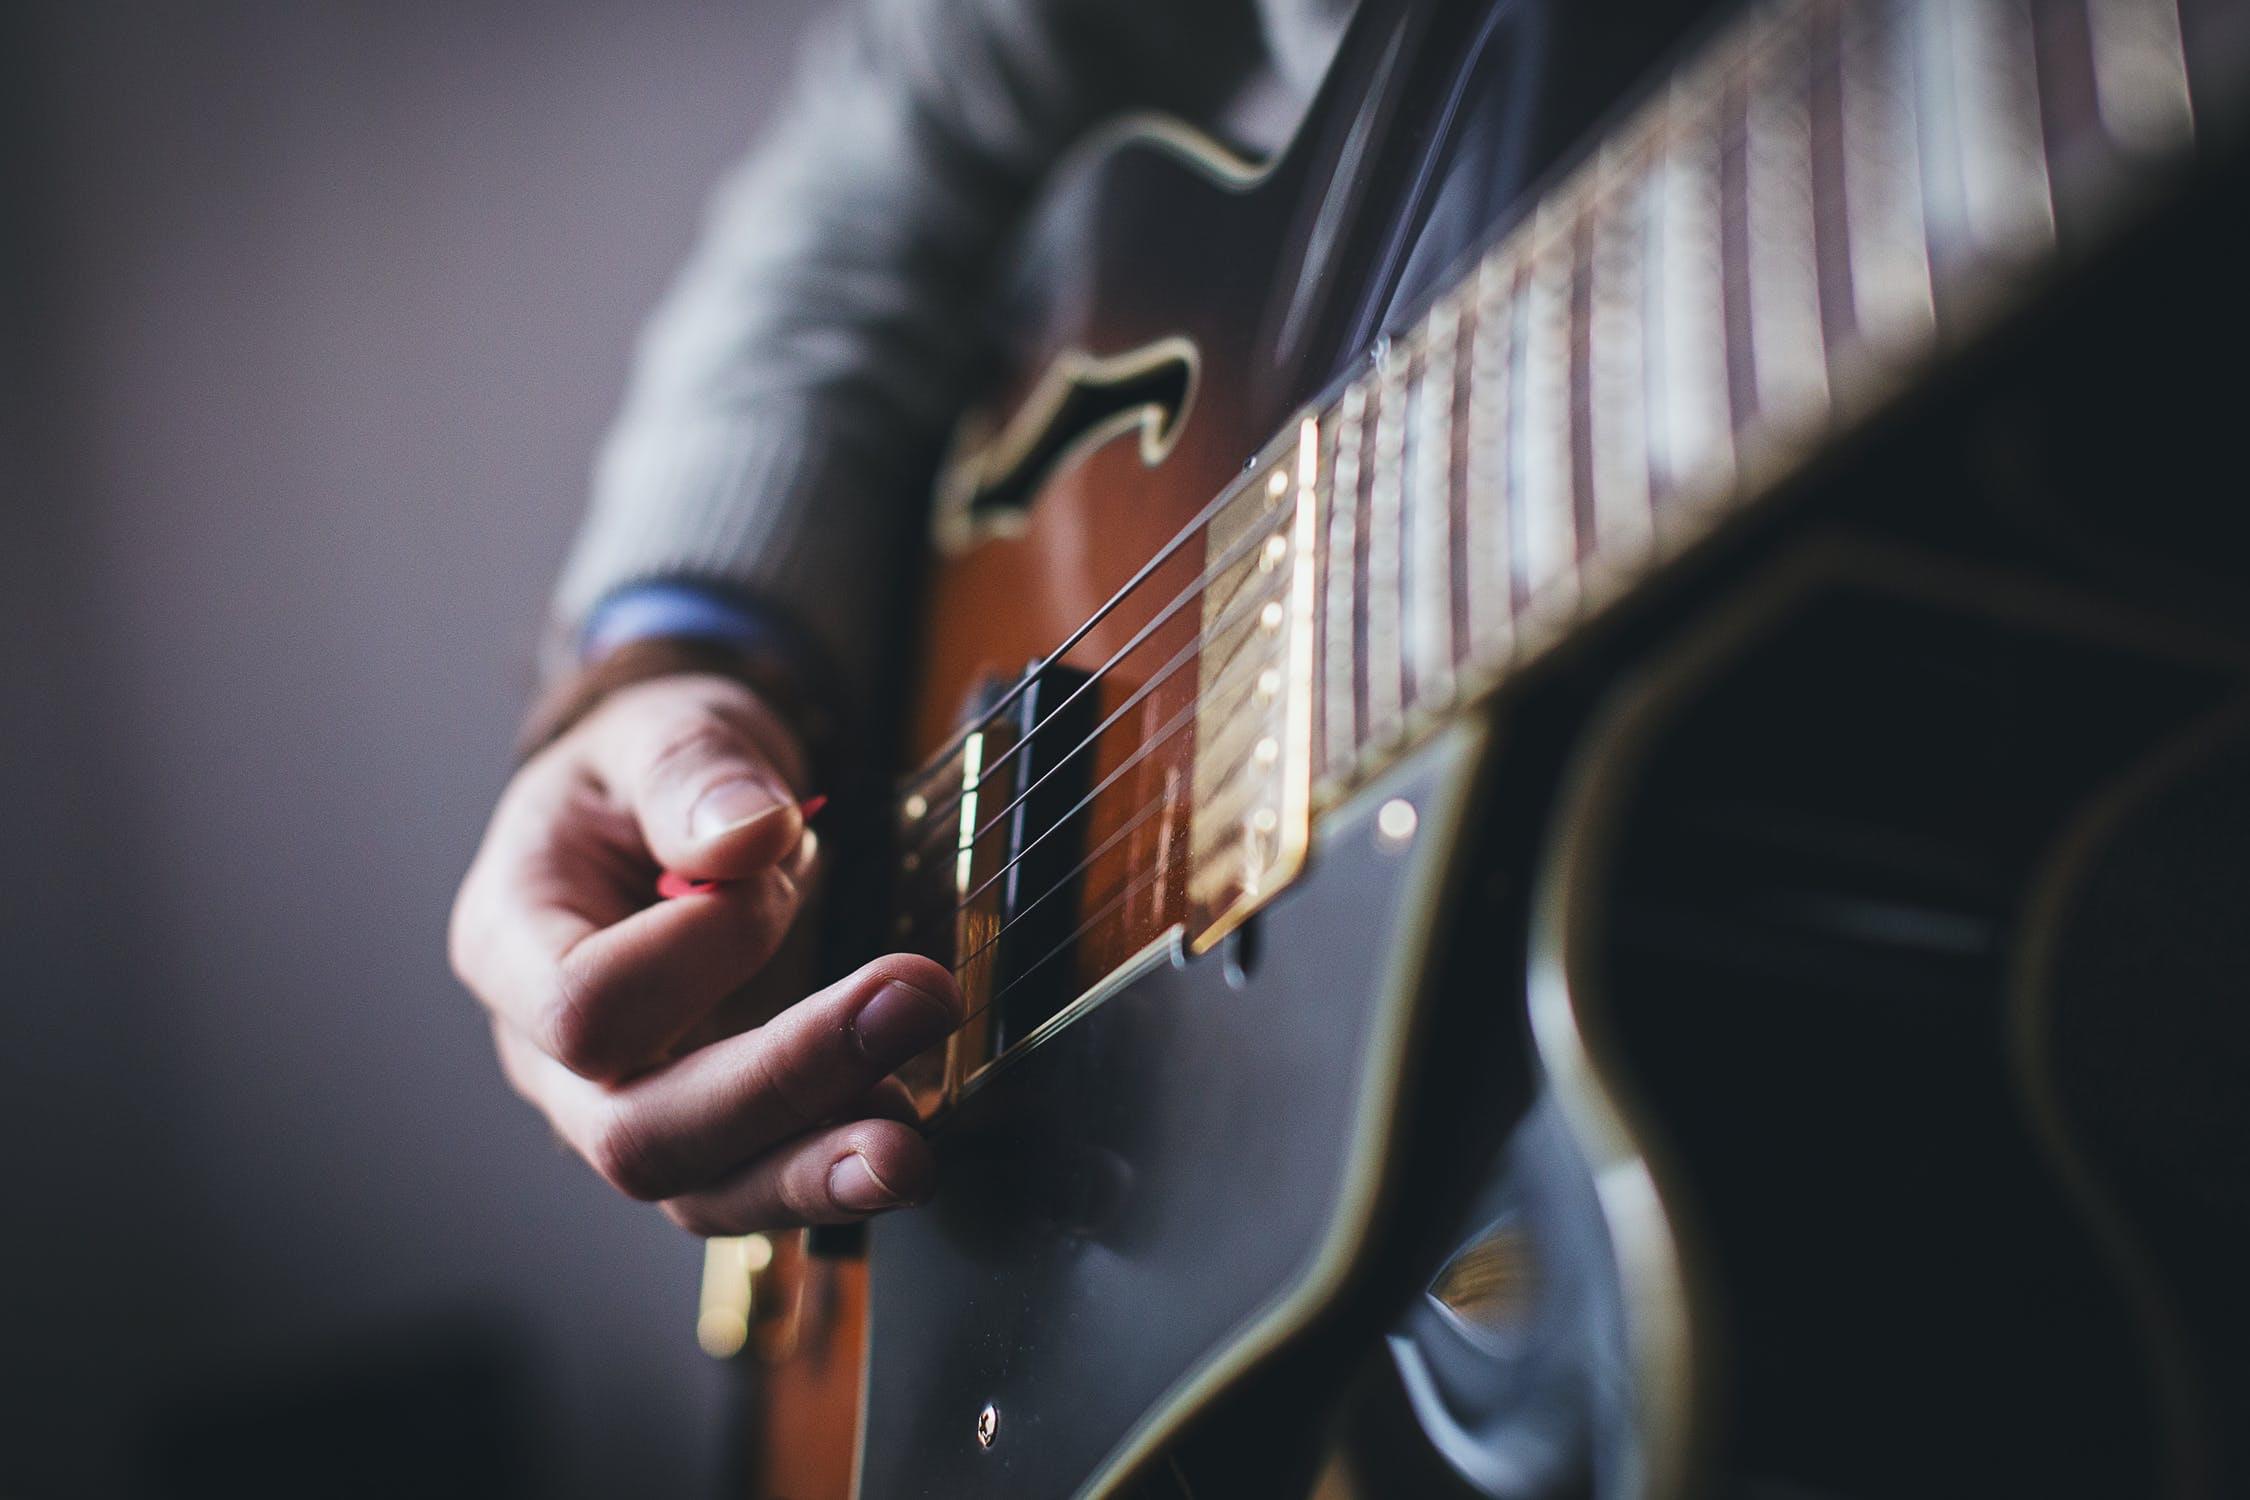 Guitar sales at record HIGH during pandemic